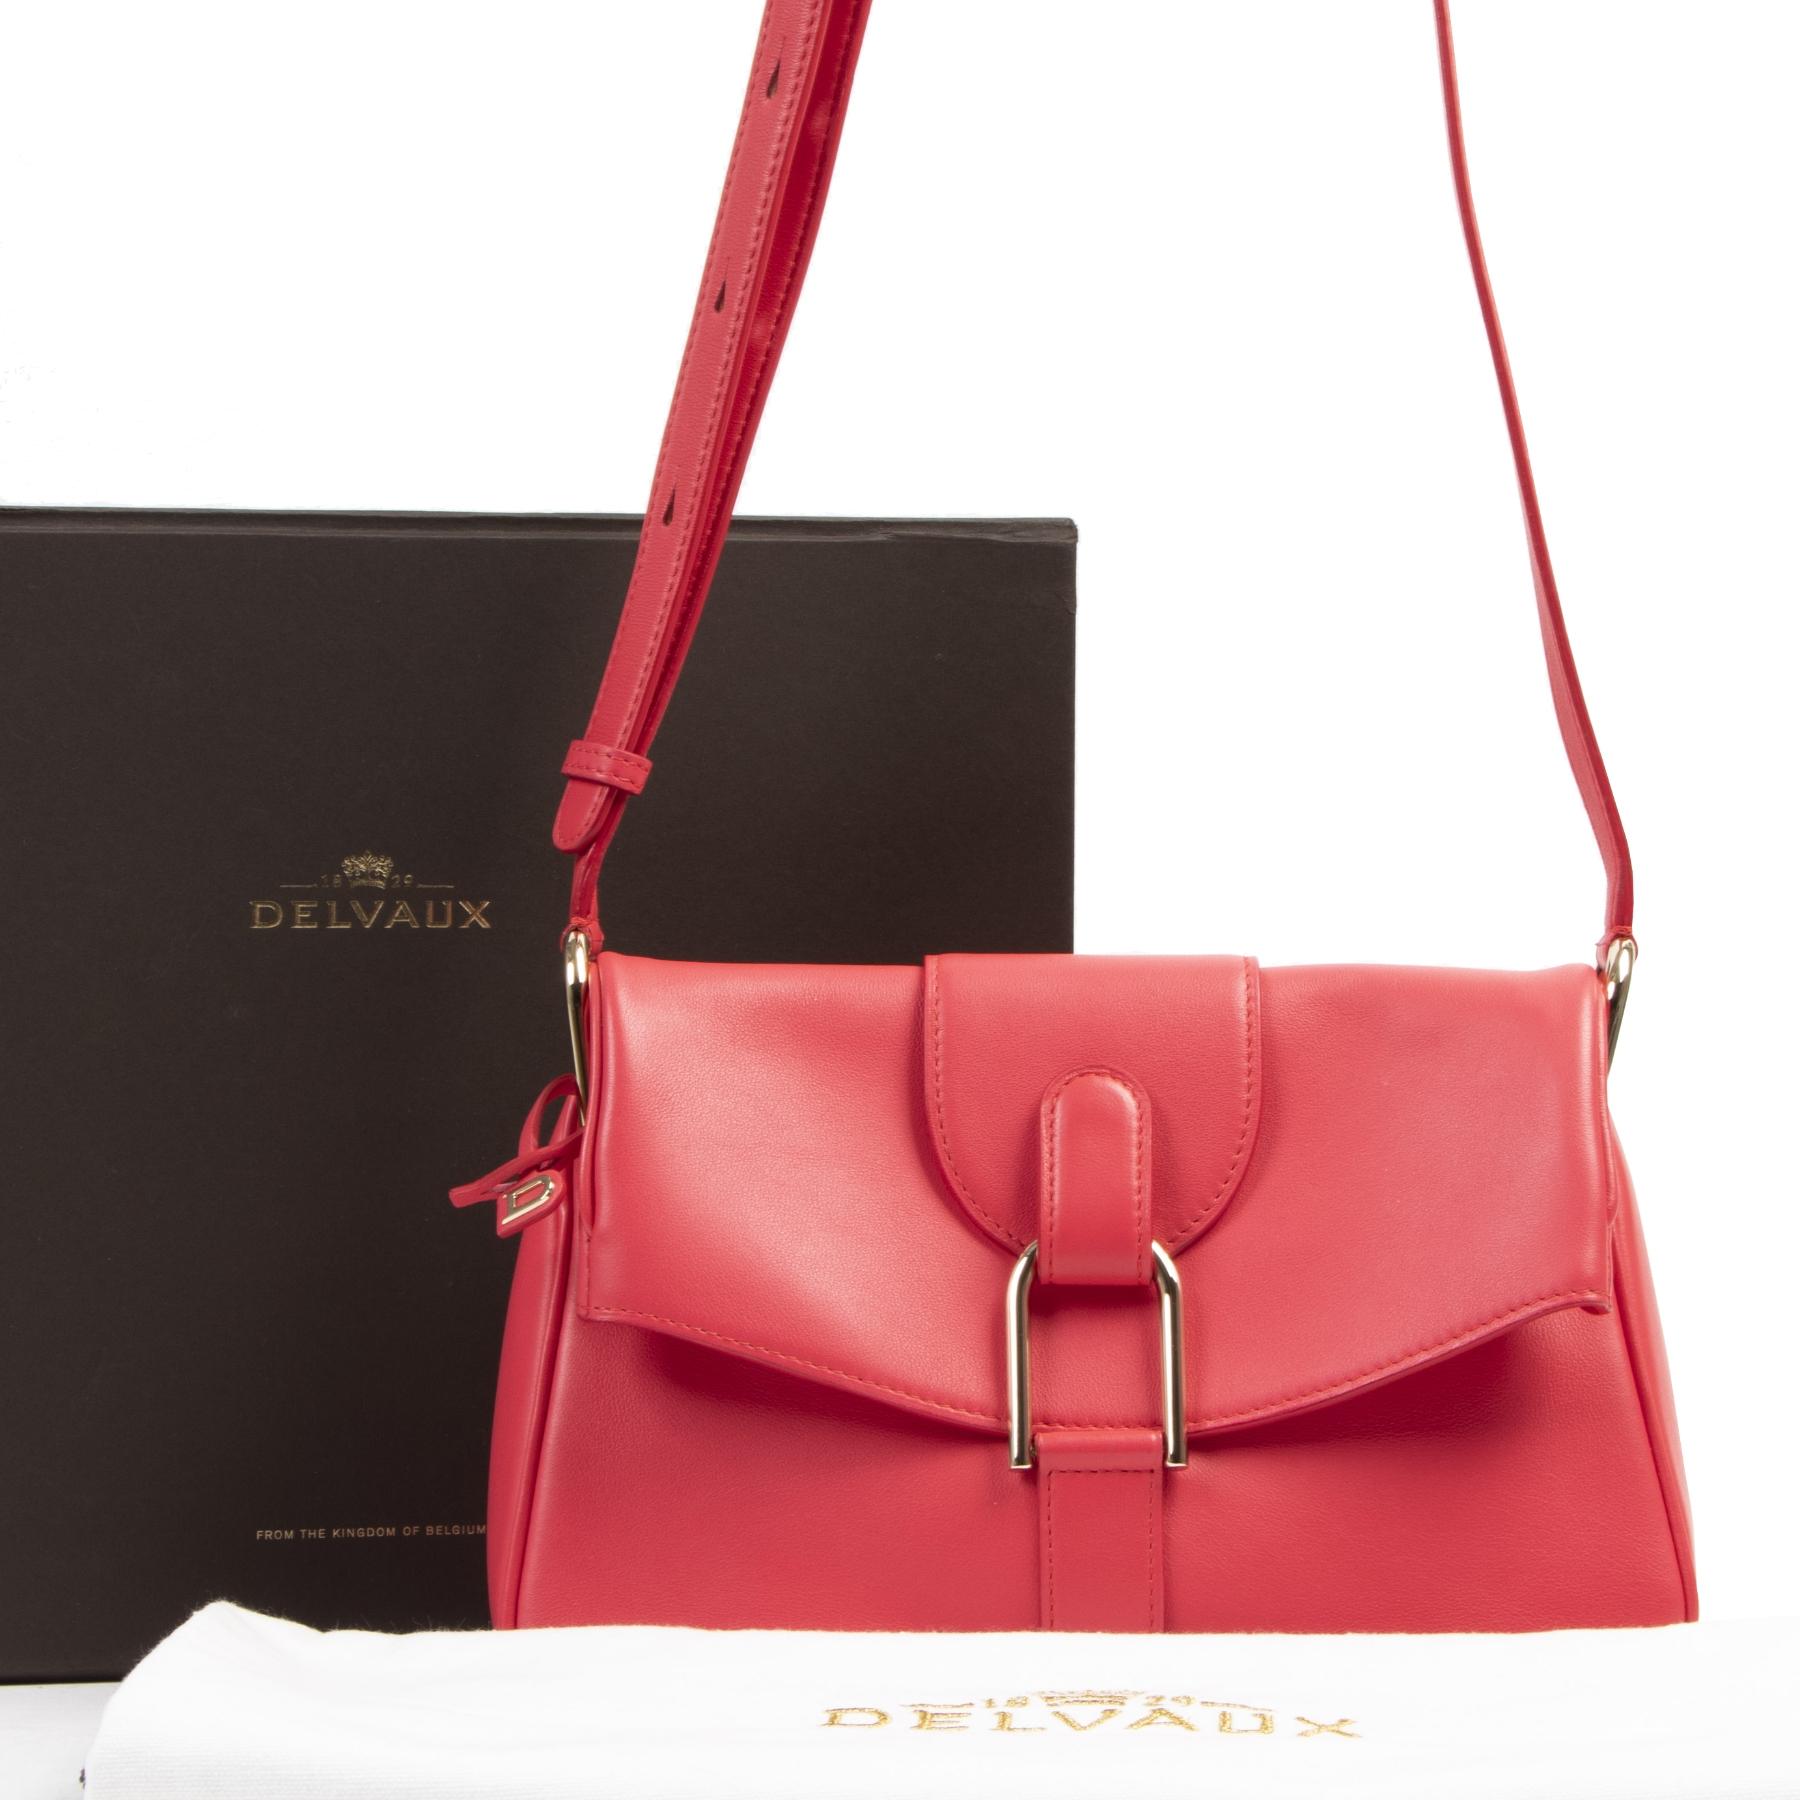 Authentieke tweedehands vintage Delvaux Red Givry Crossbody Bag koop online webshop LabelLOV